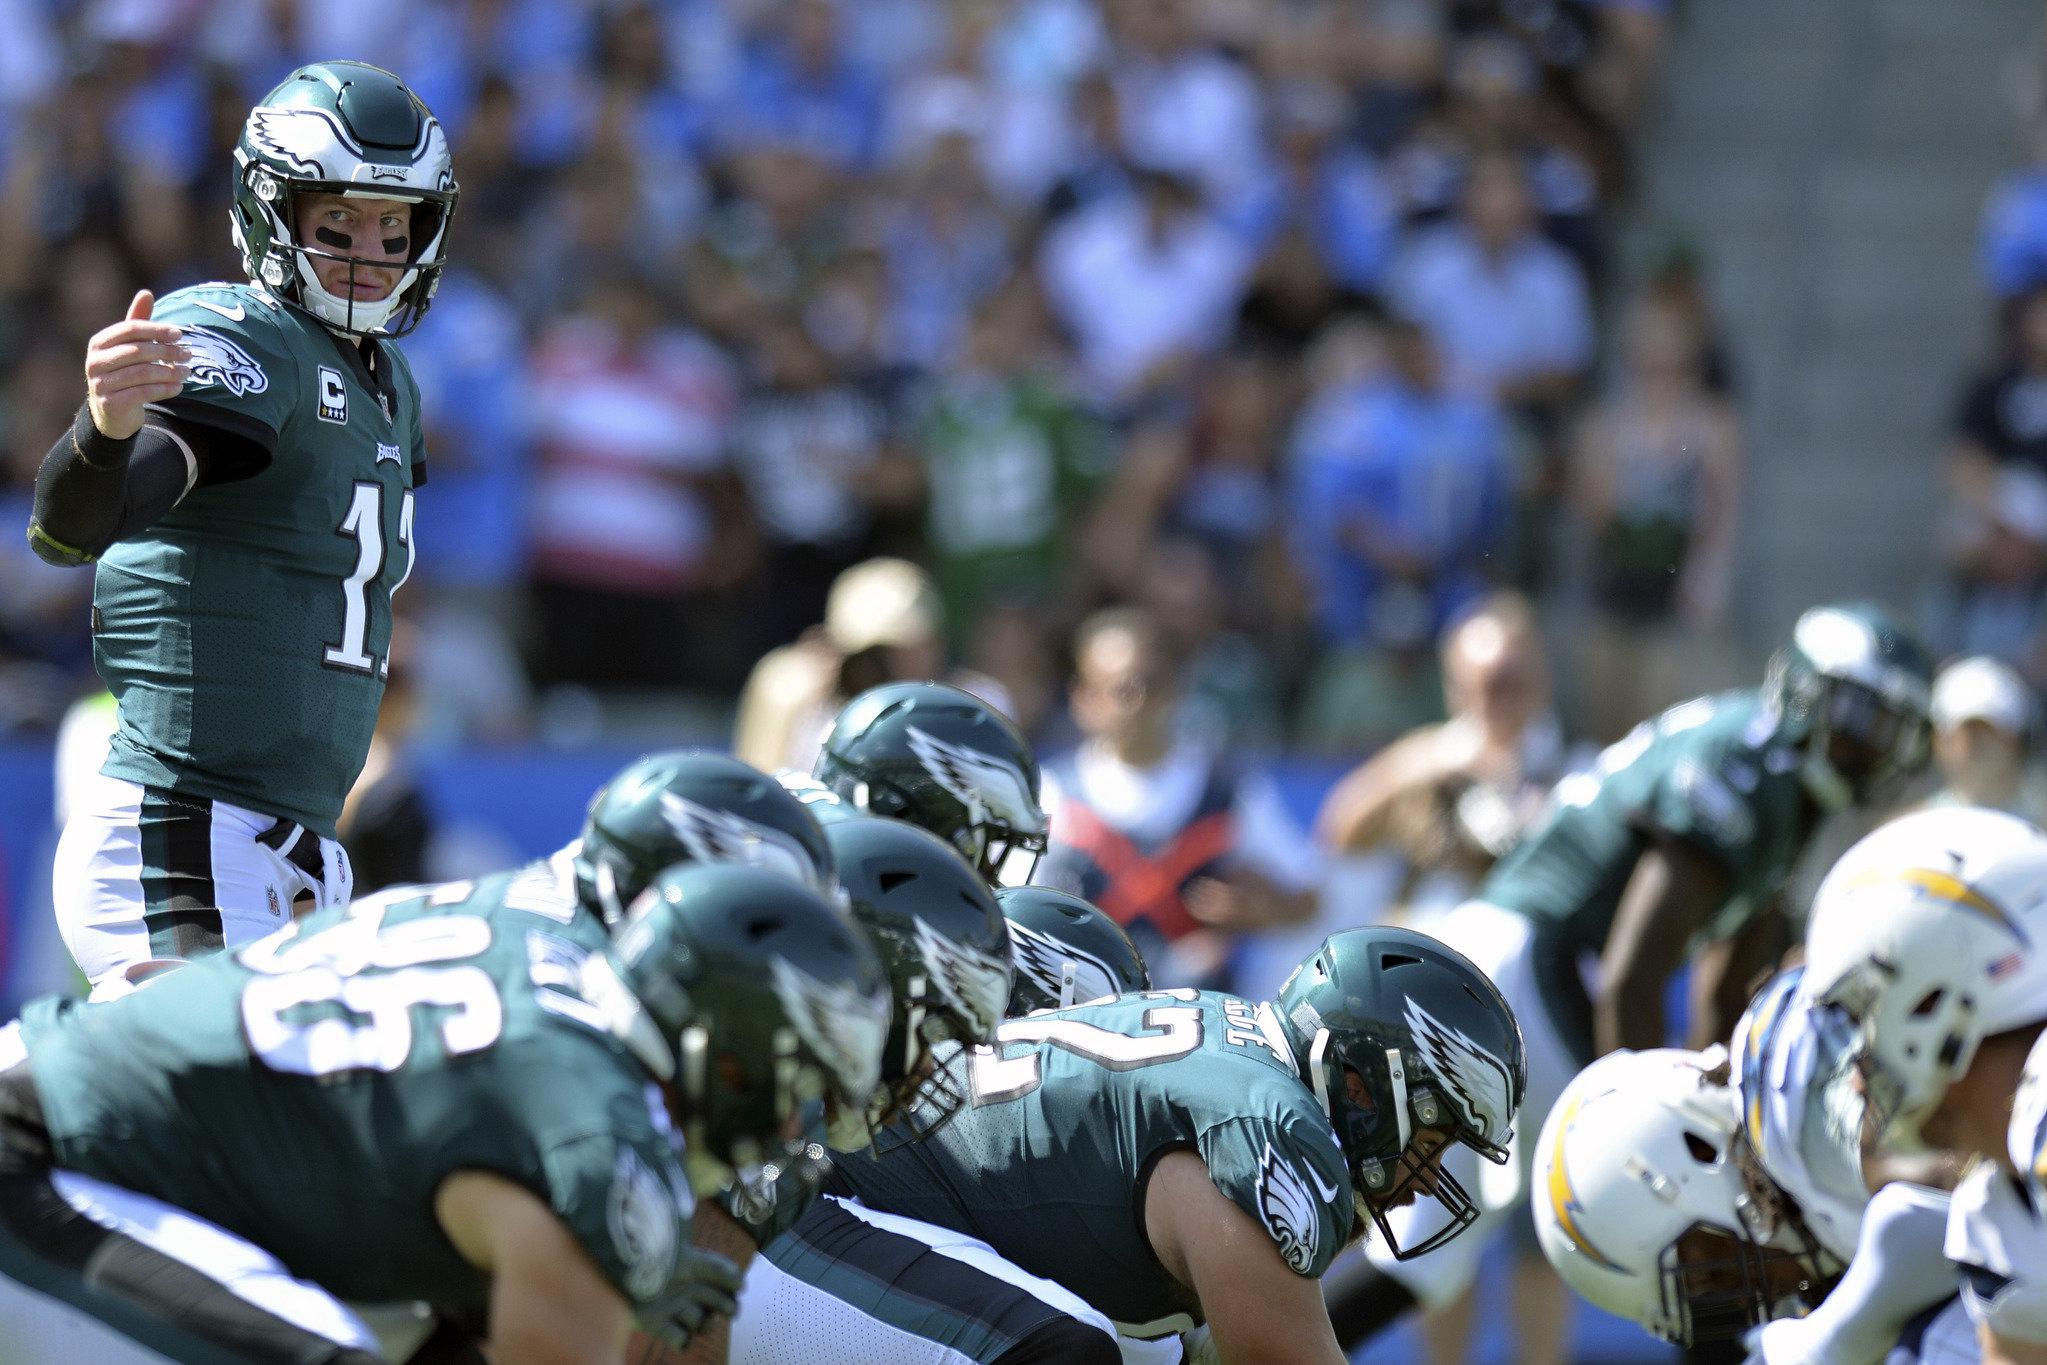 Nfl Week 4 Casa Stregata Philadelphia Eagles Vs Los